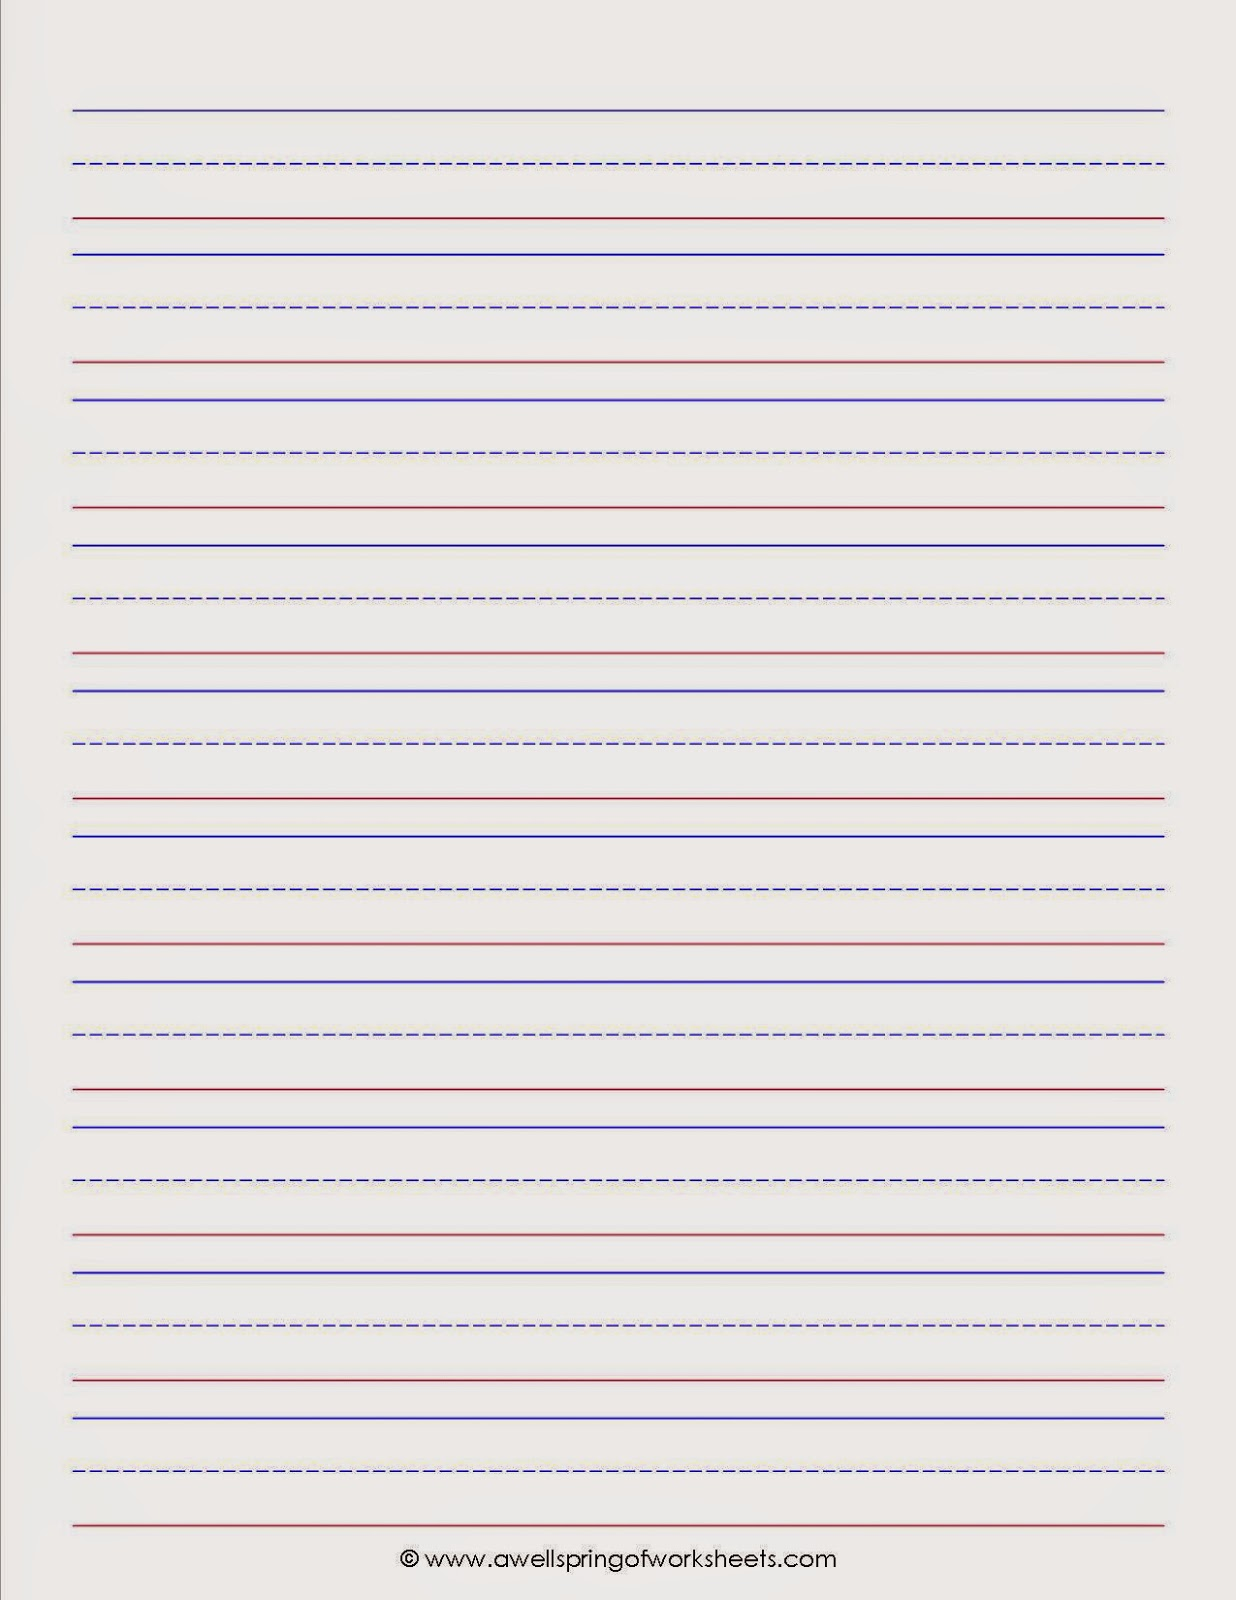 free printable line paper